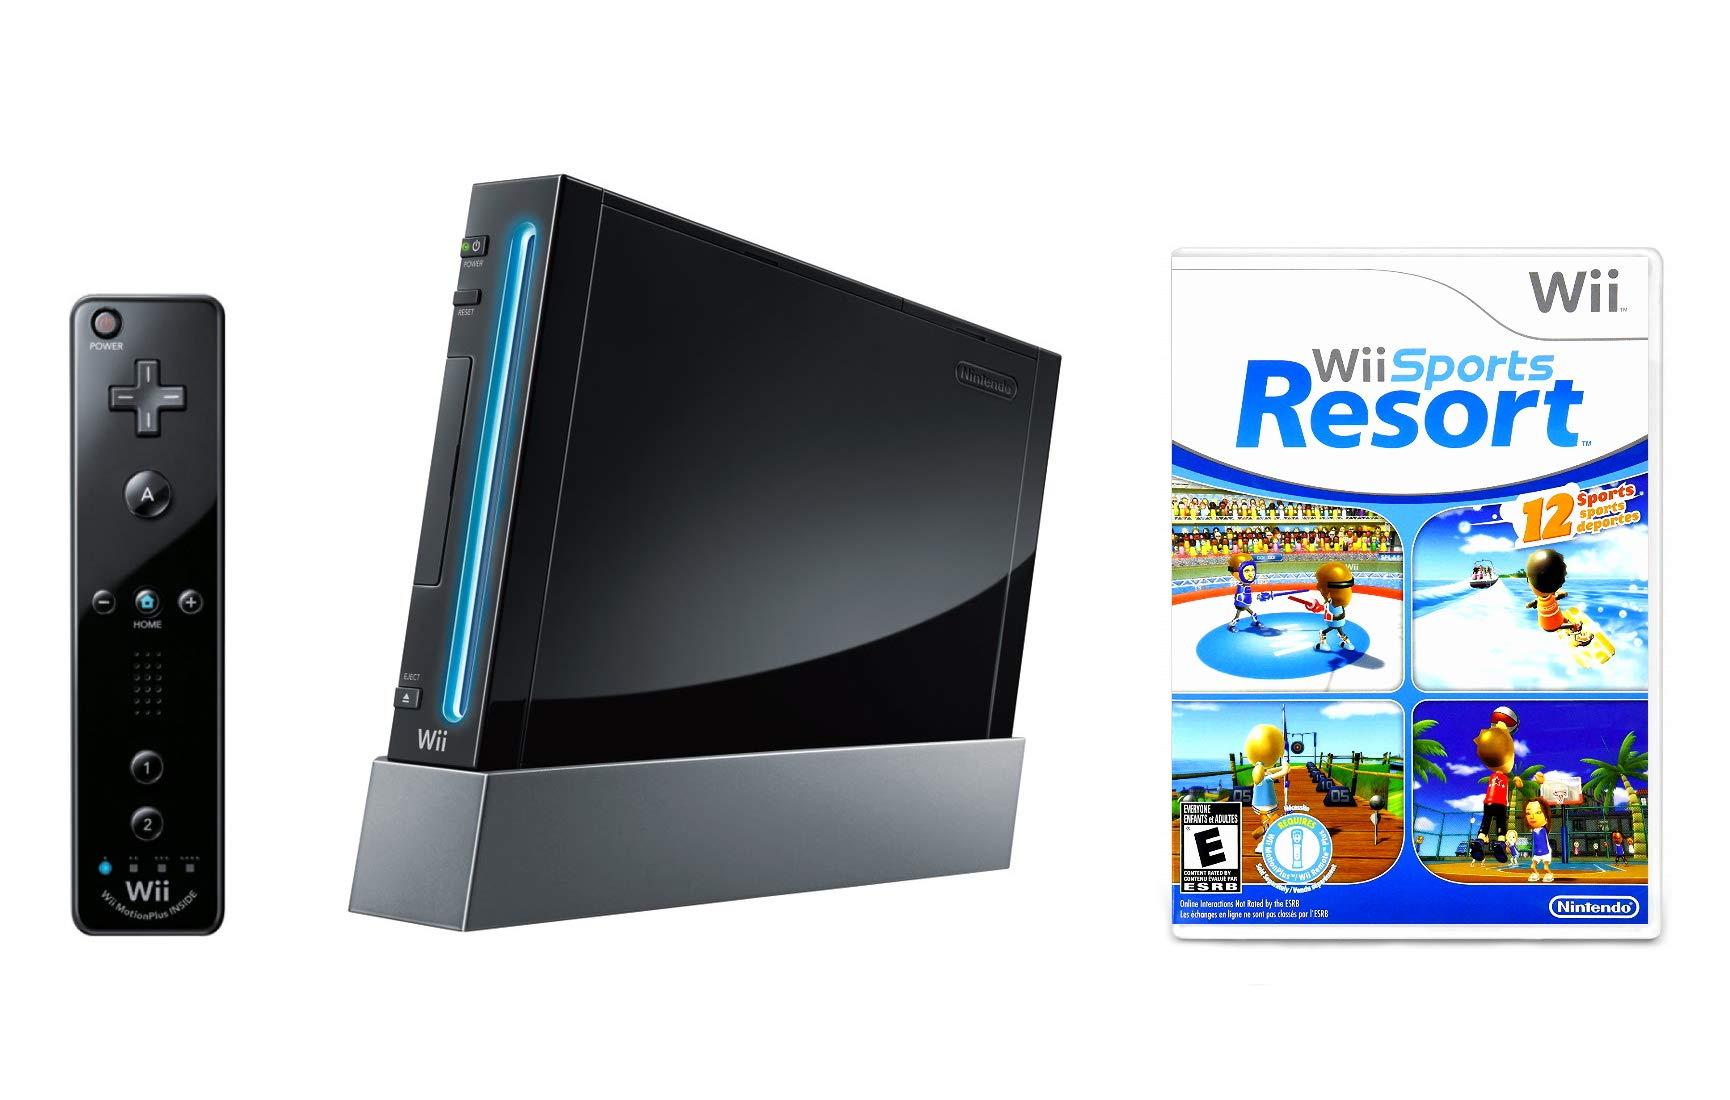 Nintendo Wii Console Black with Wii Sports Resort (Renewed) by Nintendo